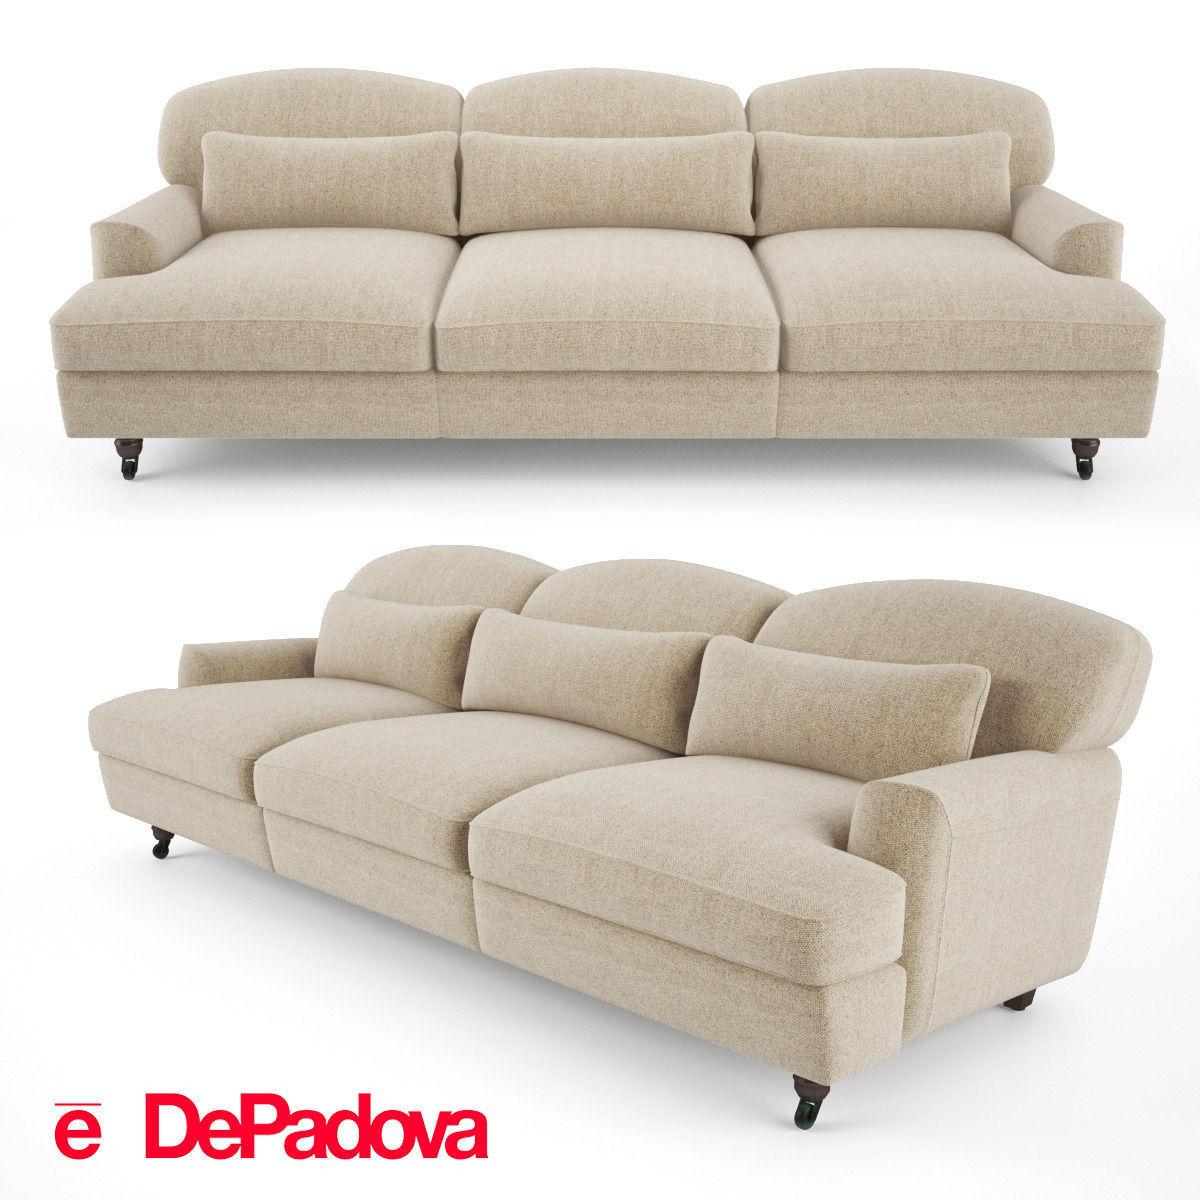 Beautiful Divani De Padova Images - acrylicgiftware.us ...